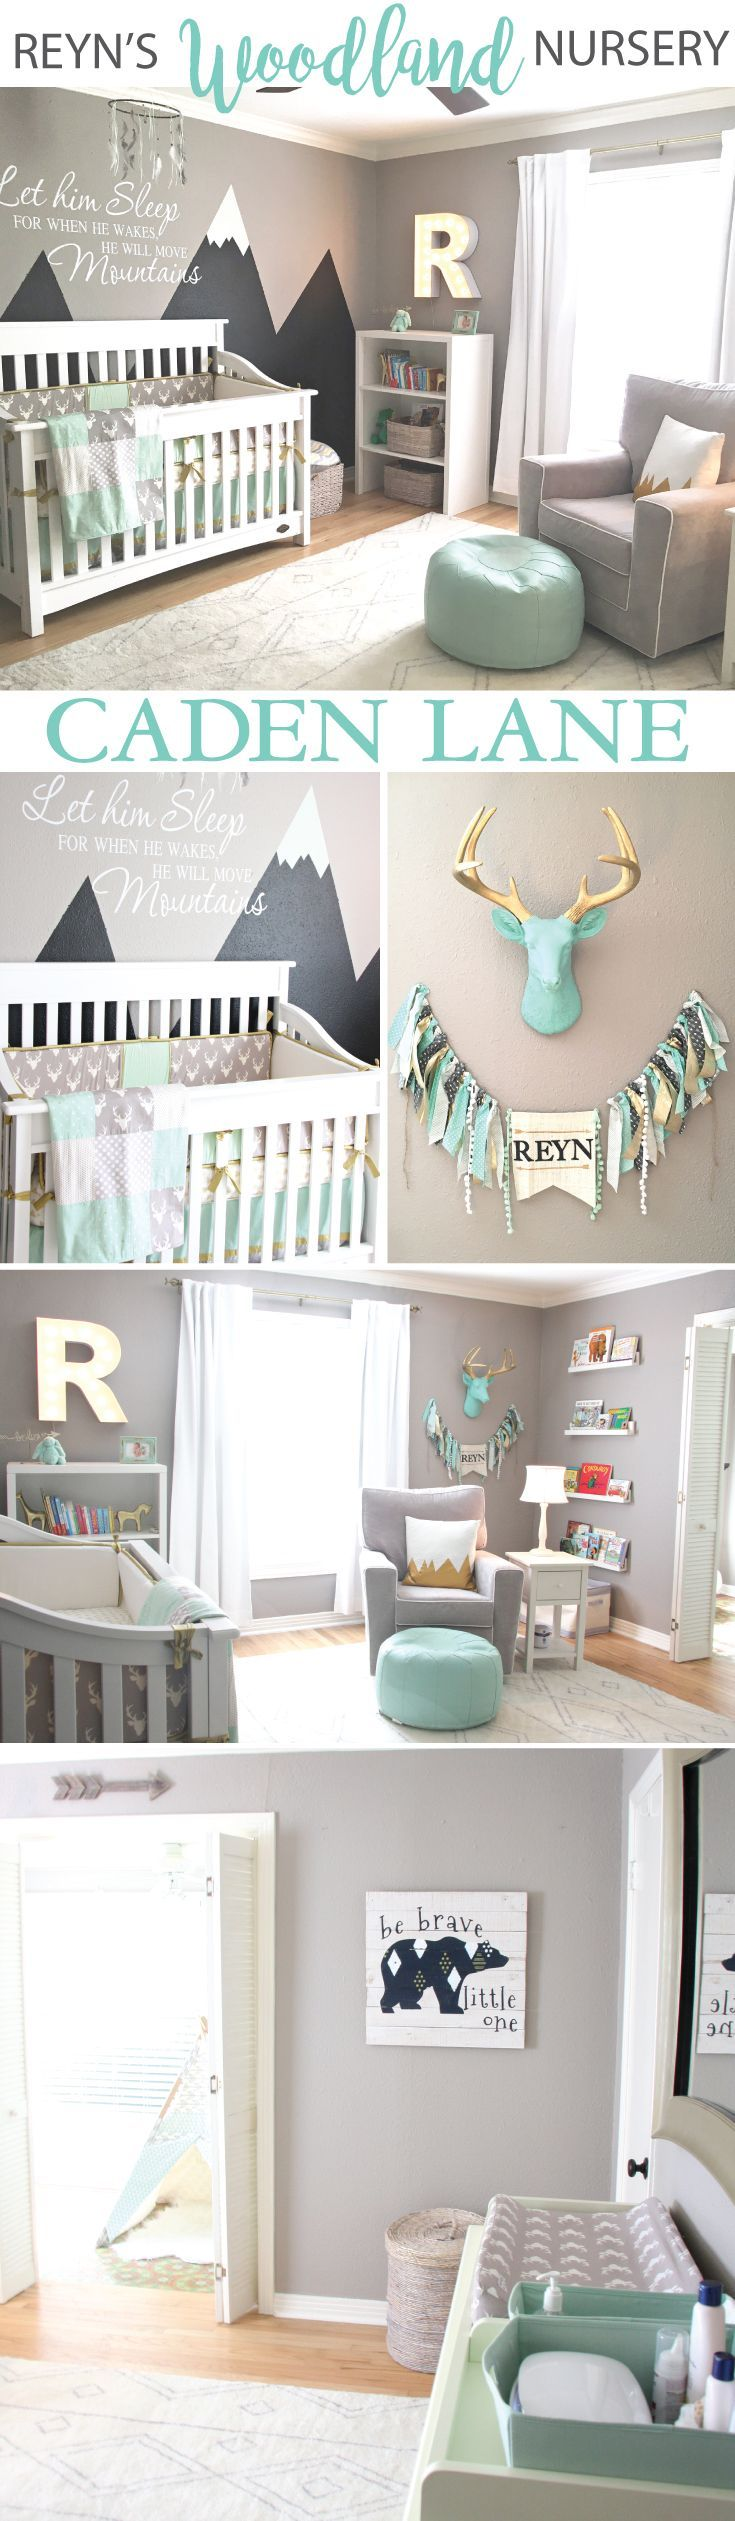 Best 25+ Nursery ideas for boys ideas on Pinterest | Boy nurseries ...